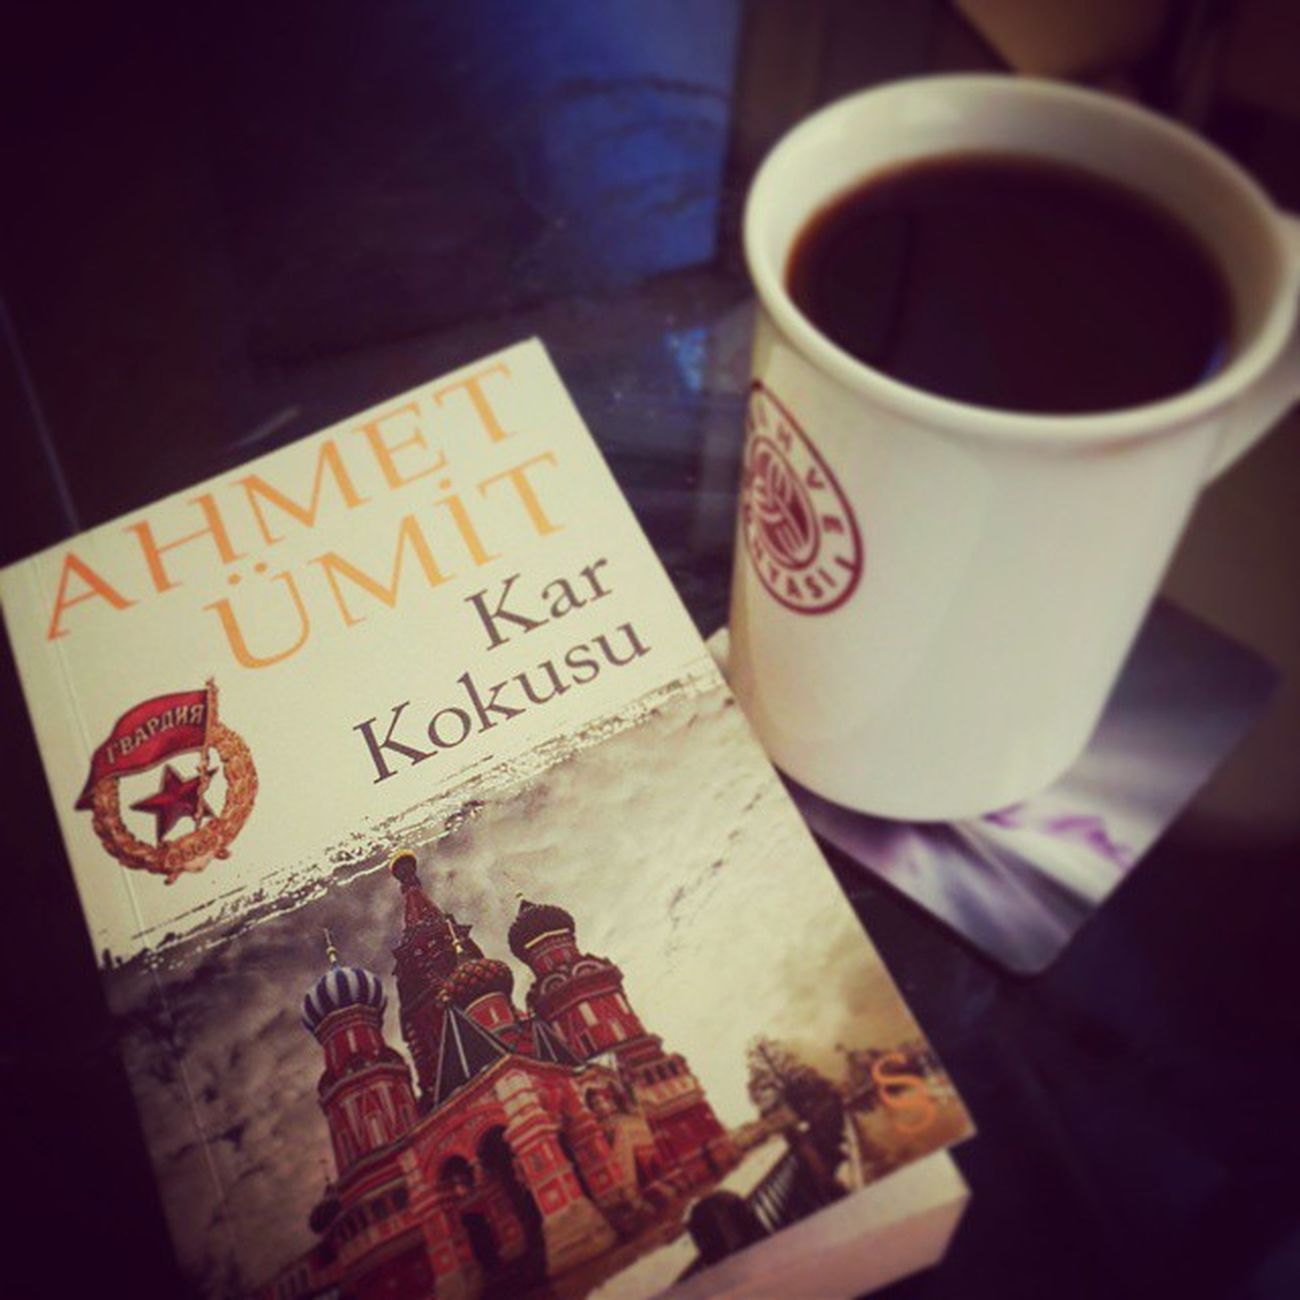 Ahmetümit Karkokusu InstaBooks Instakitap tilkikitap kitapklubü reading keyiflisaatler kahve coffee